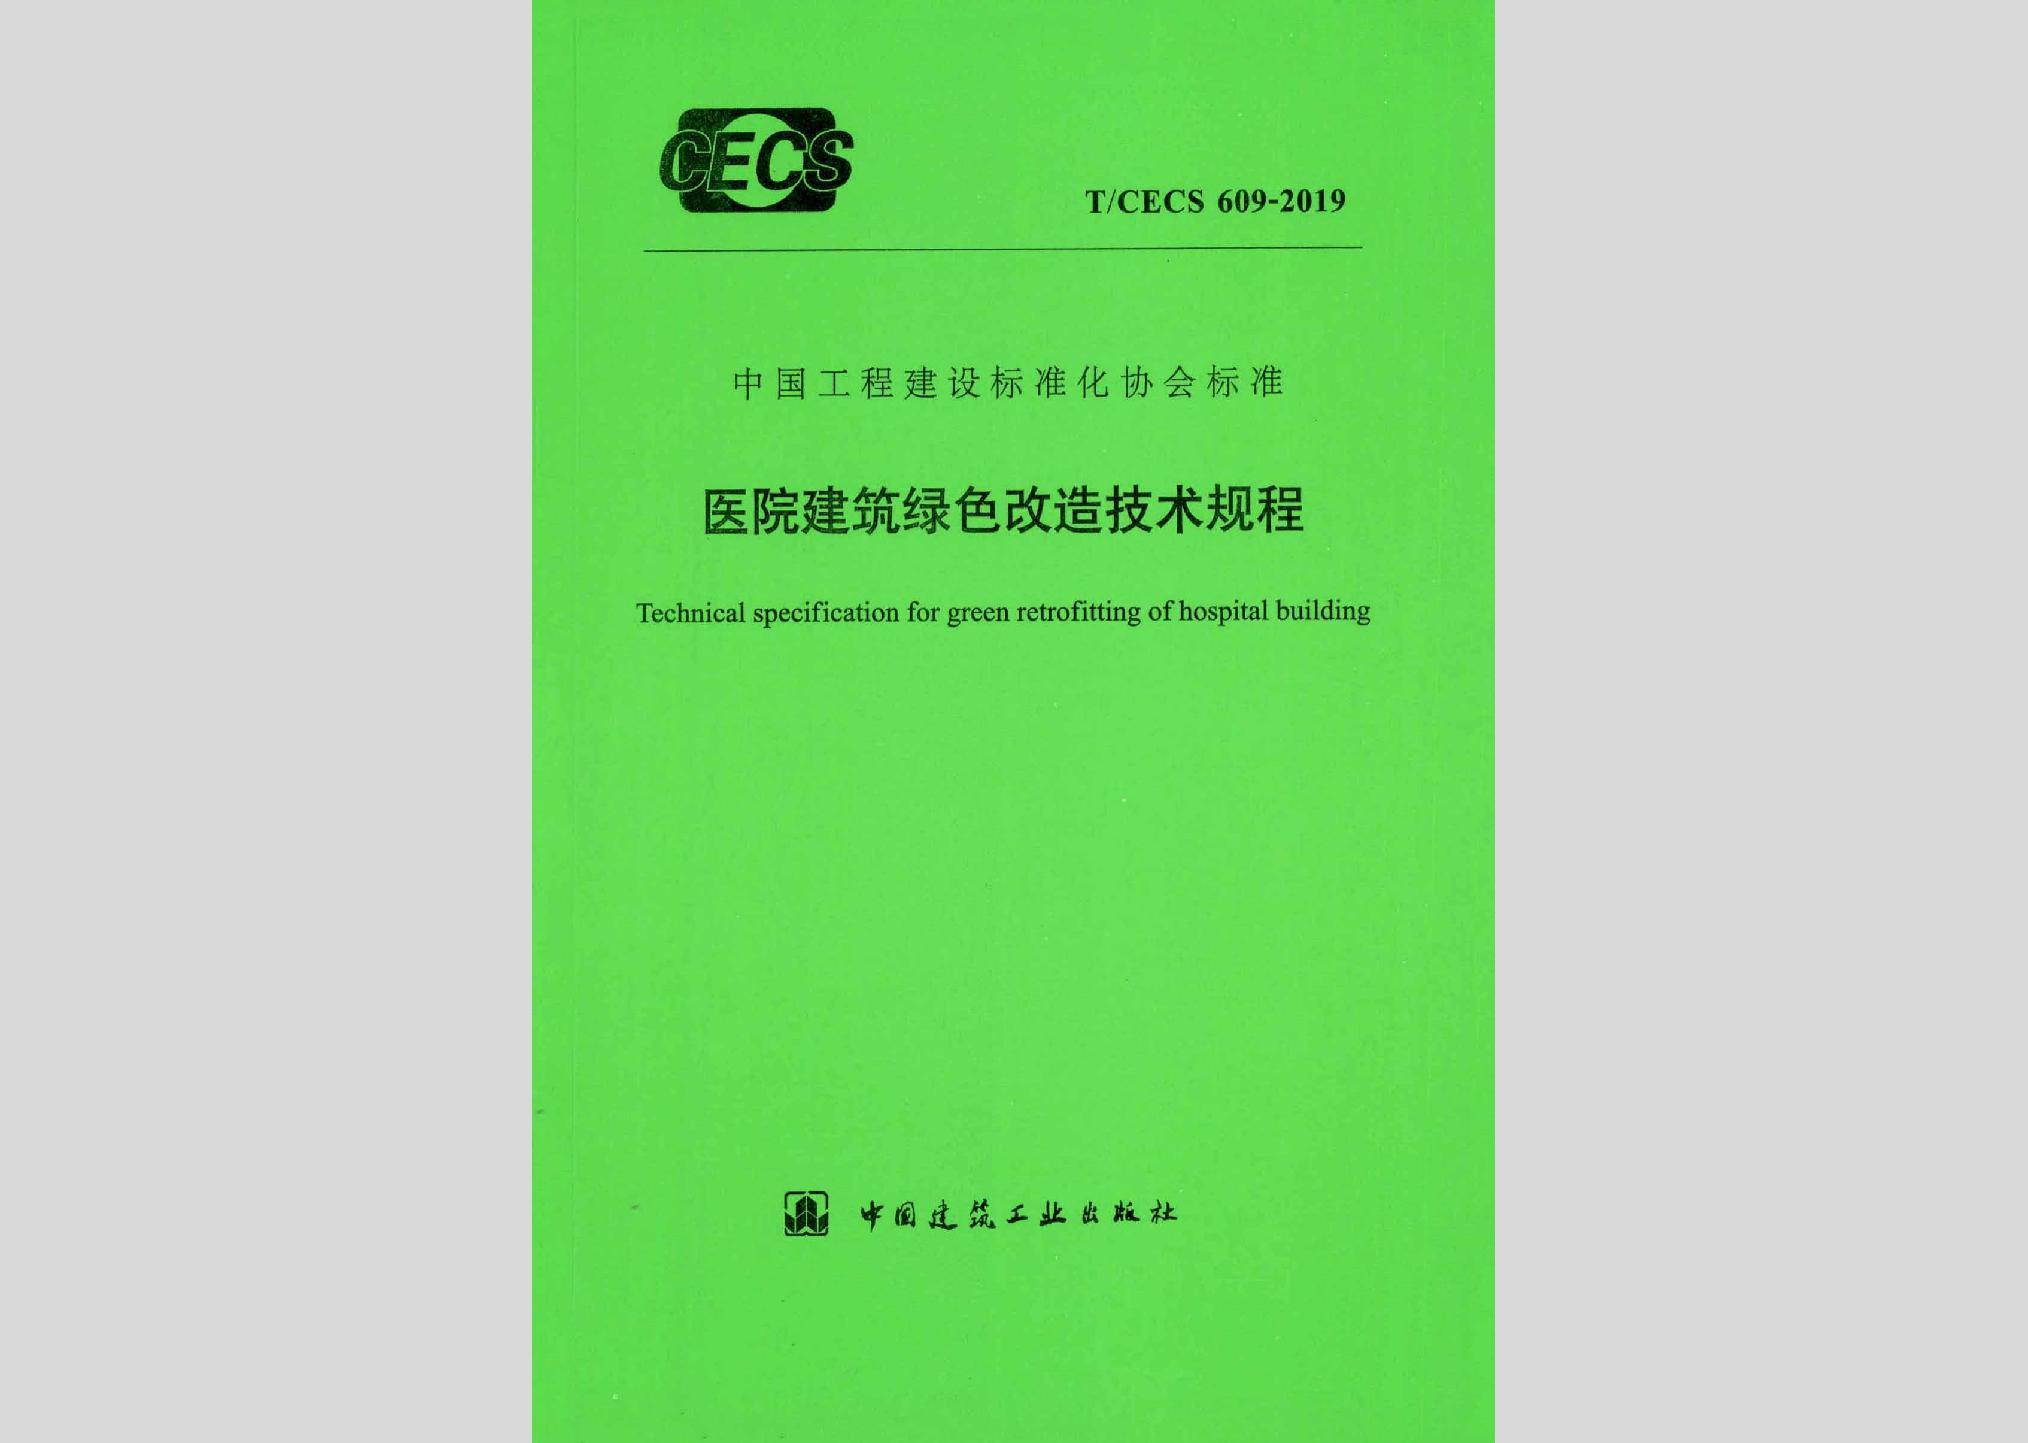 T/CECS609-2019:医院建筑绿色改造技术规程